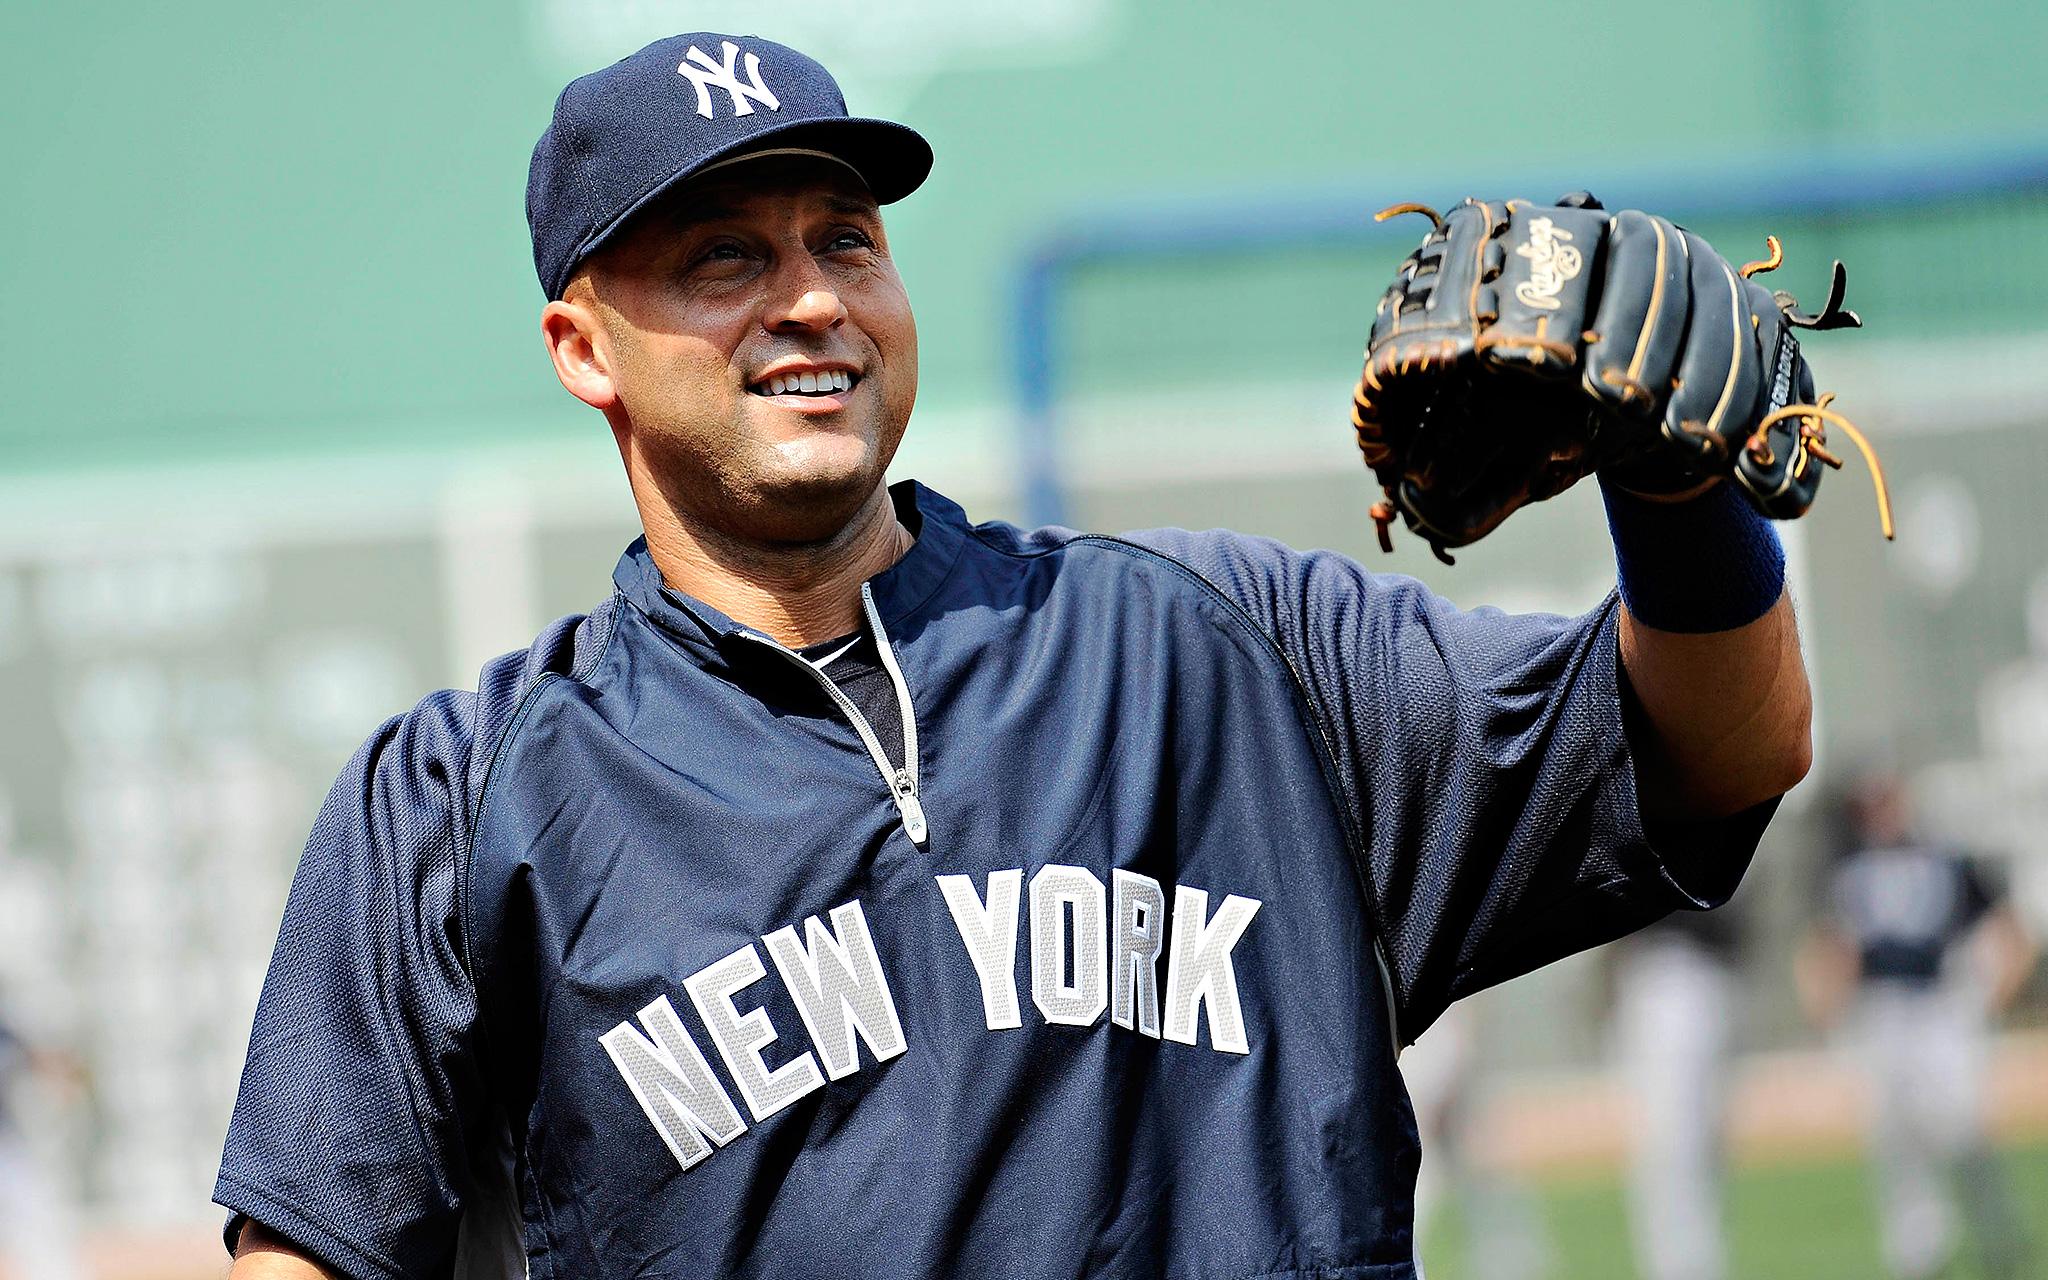 2. Derek Jeter, Yankees - 12 percent